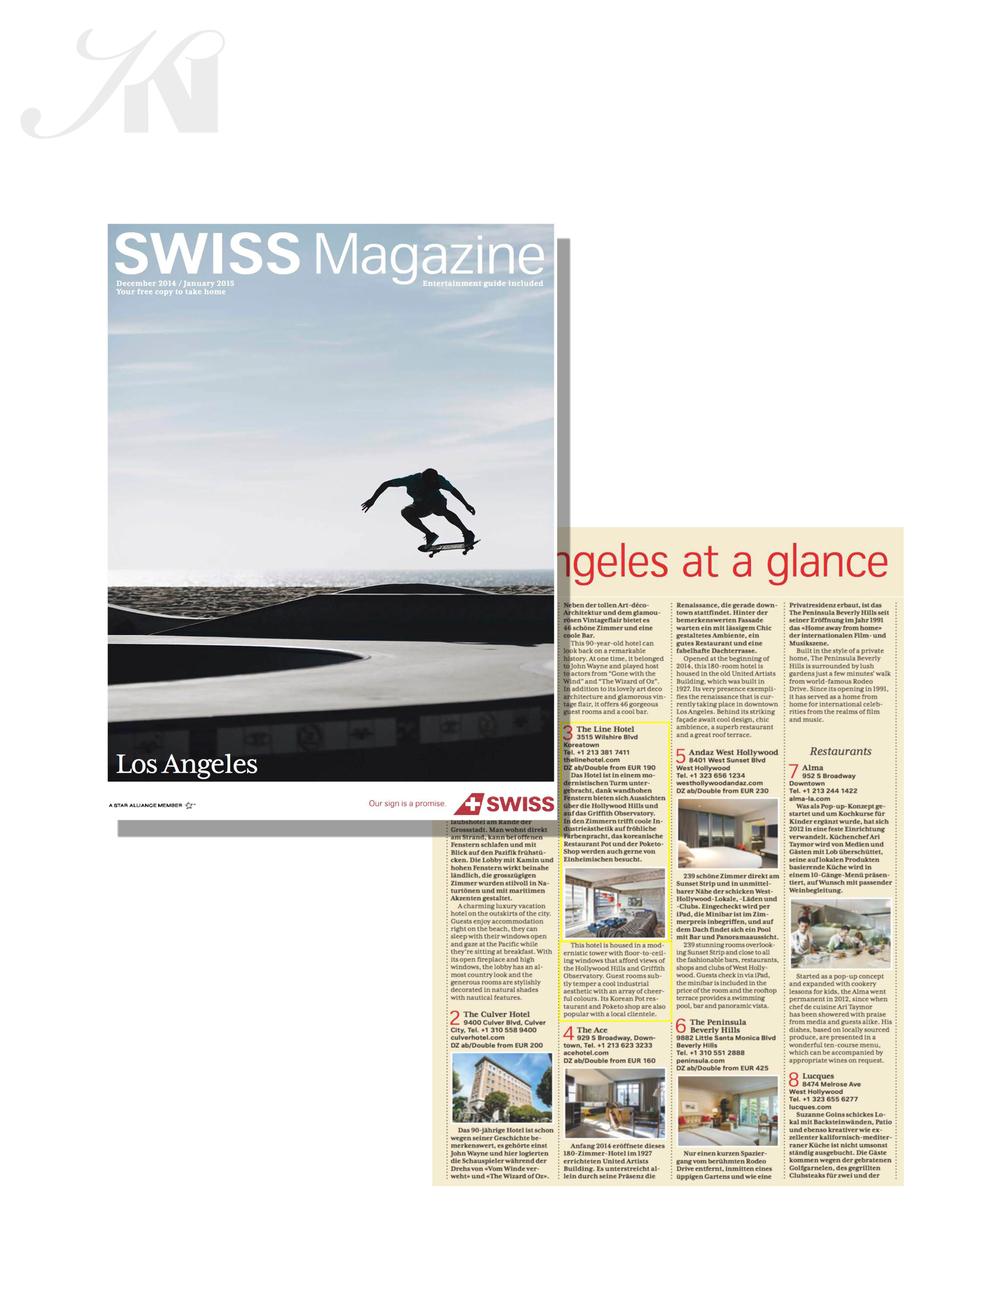 SWISS MAG 2014.jpg